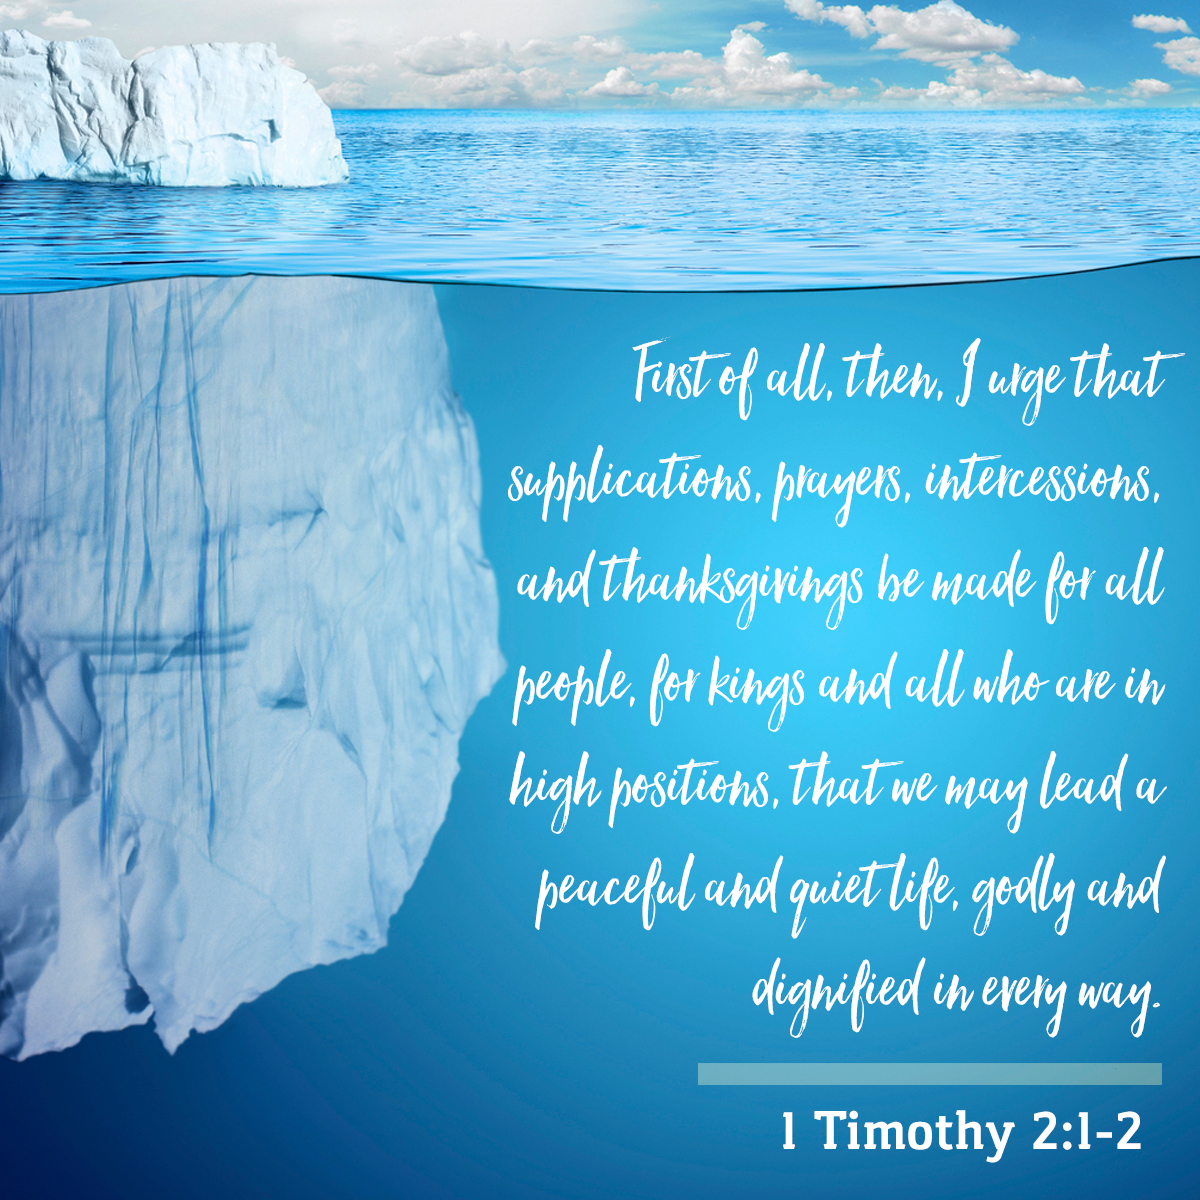 1 Timothy 2:1-2